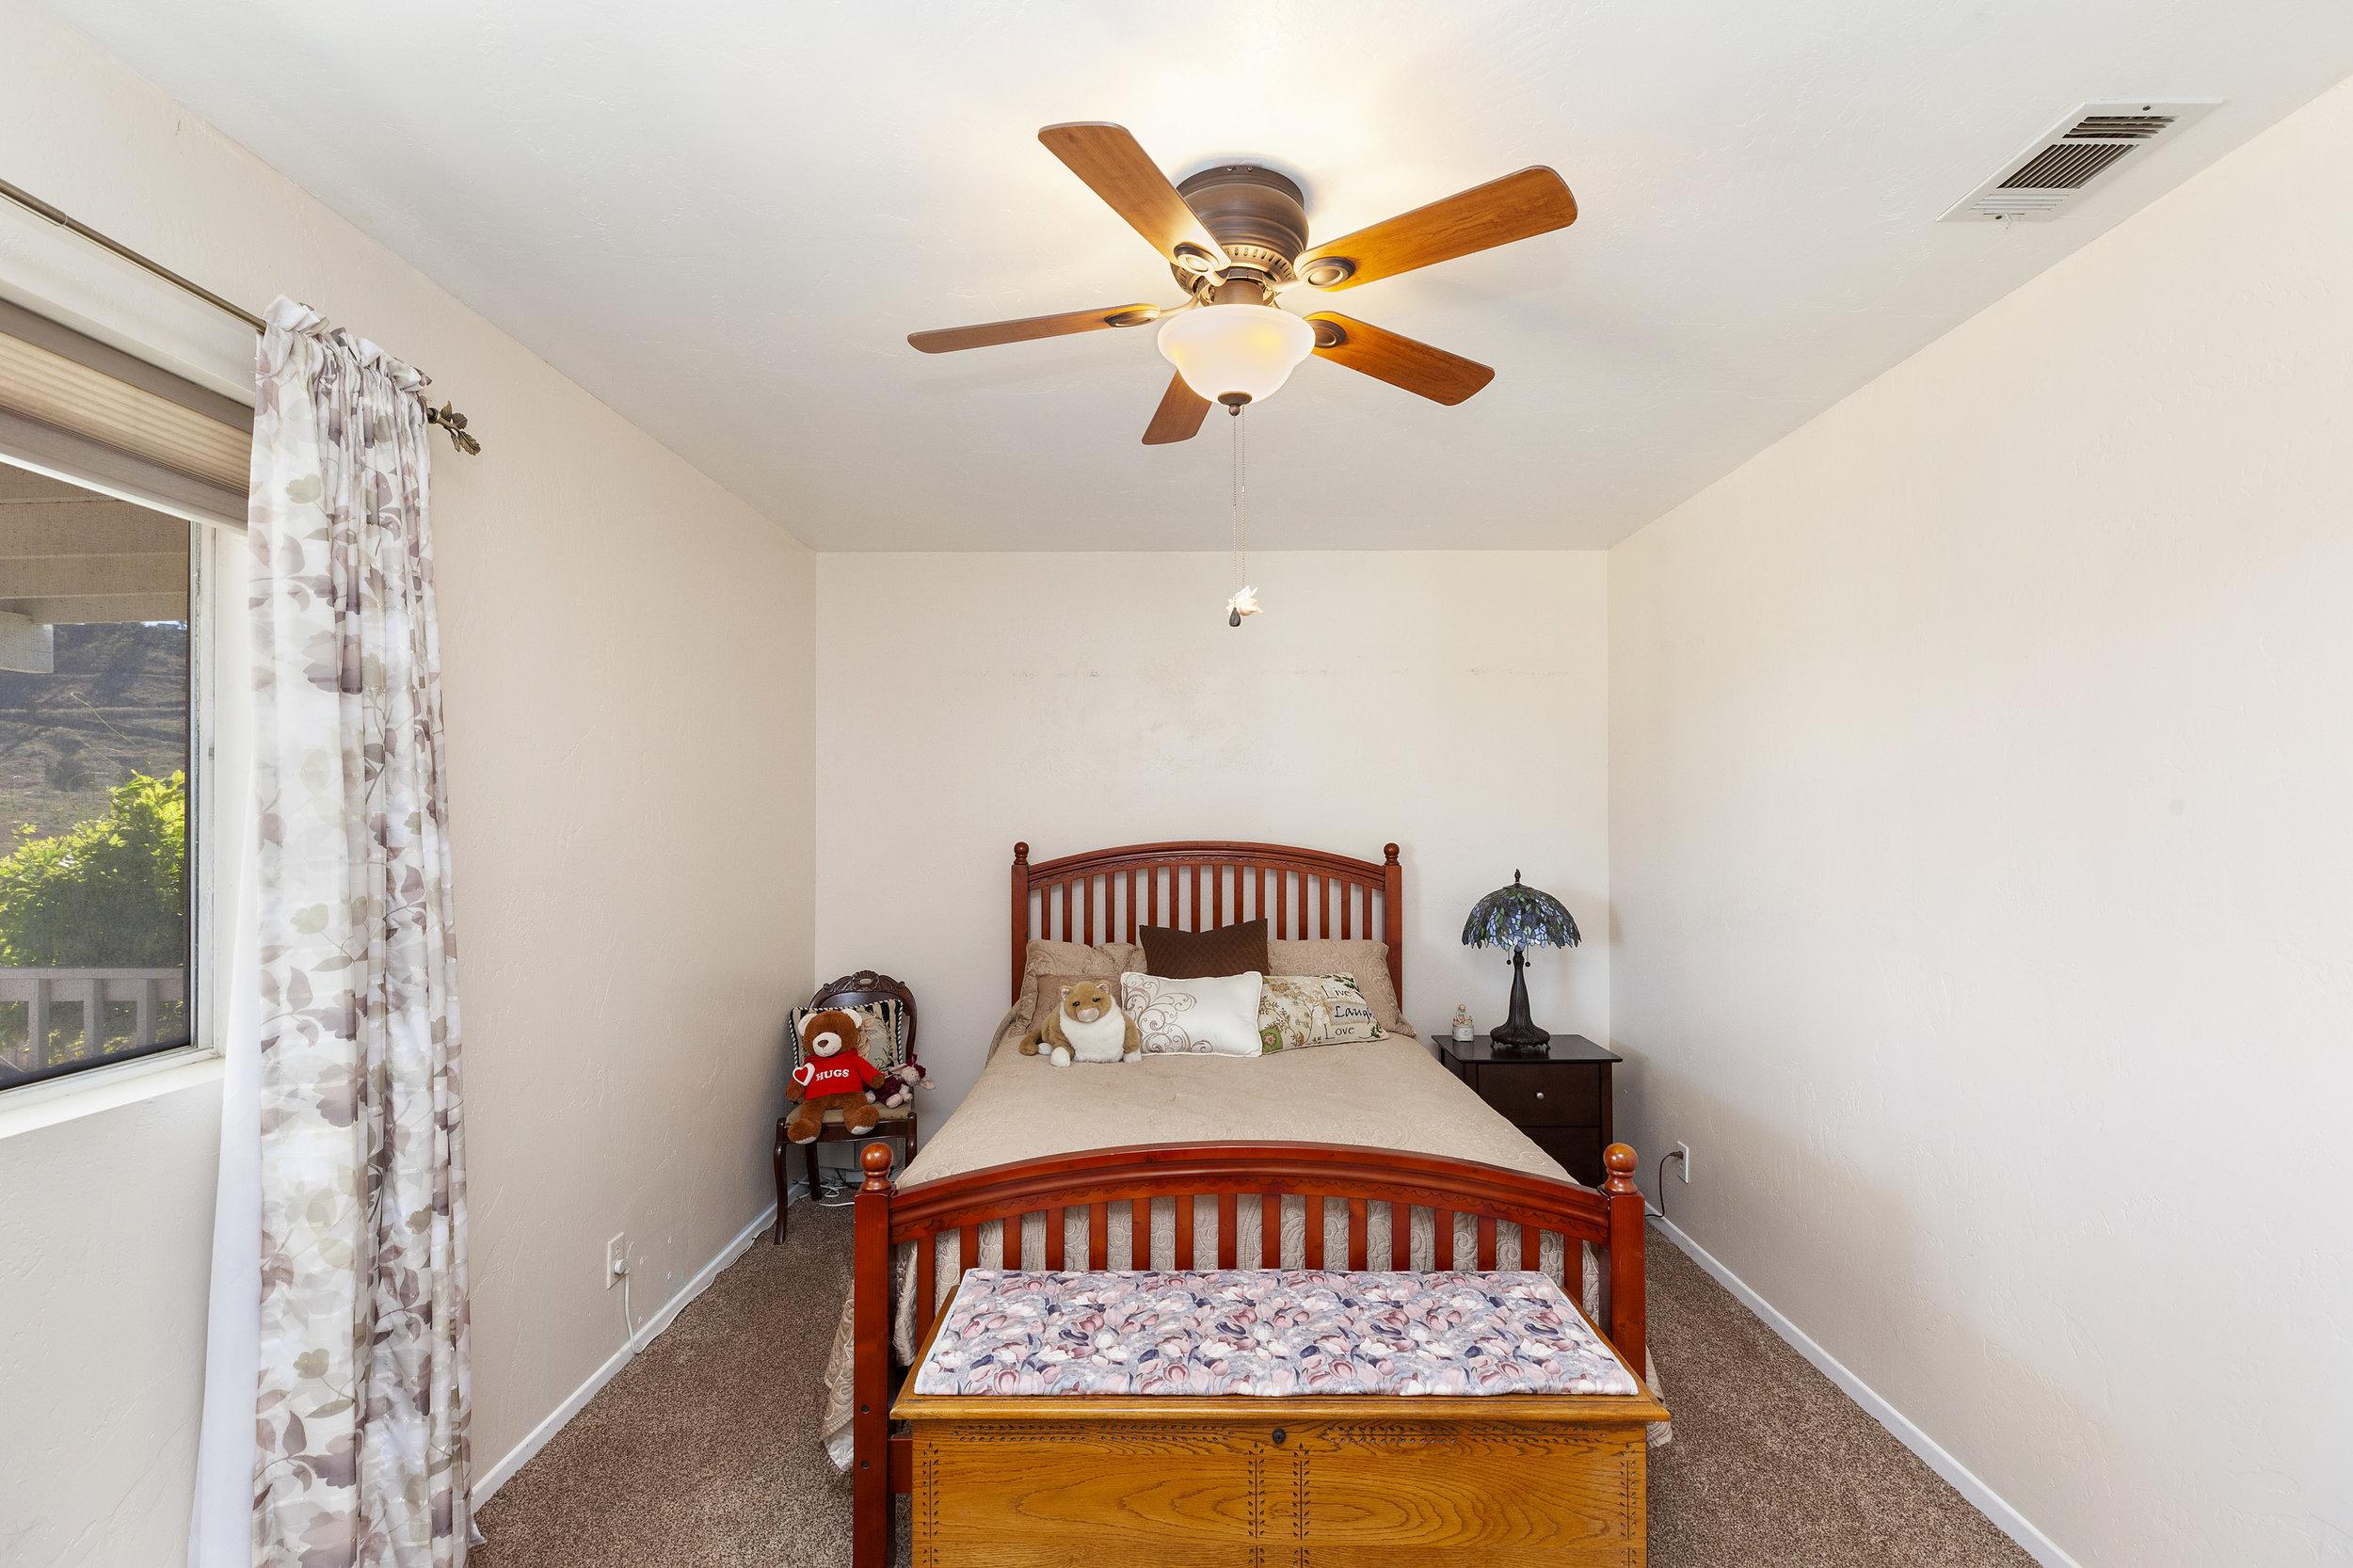 022_Bedroom 3.jpg